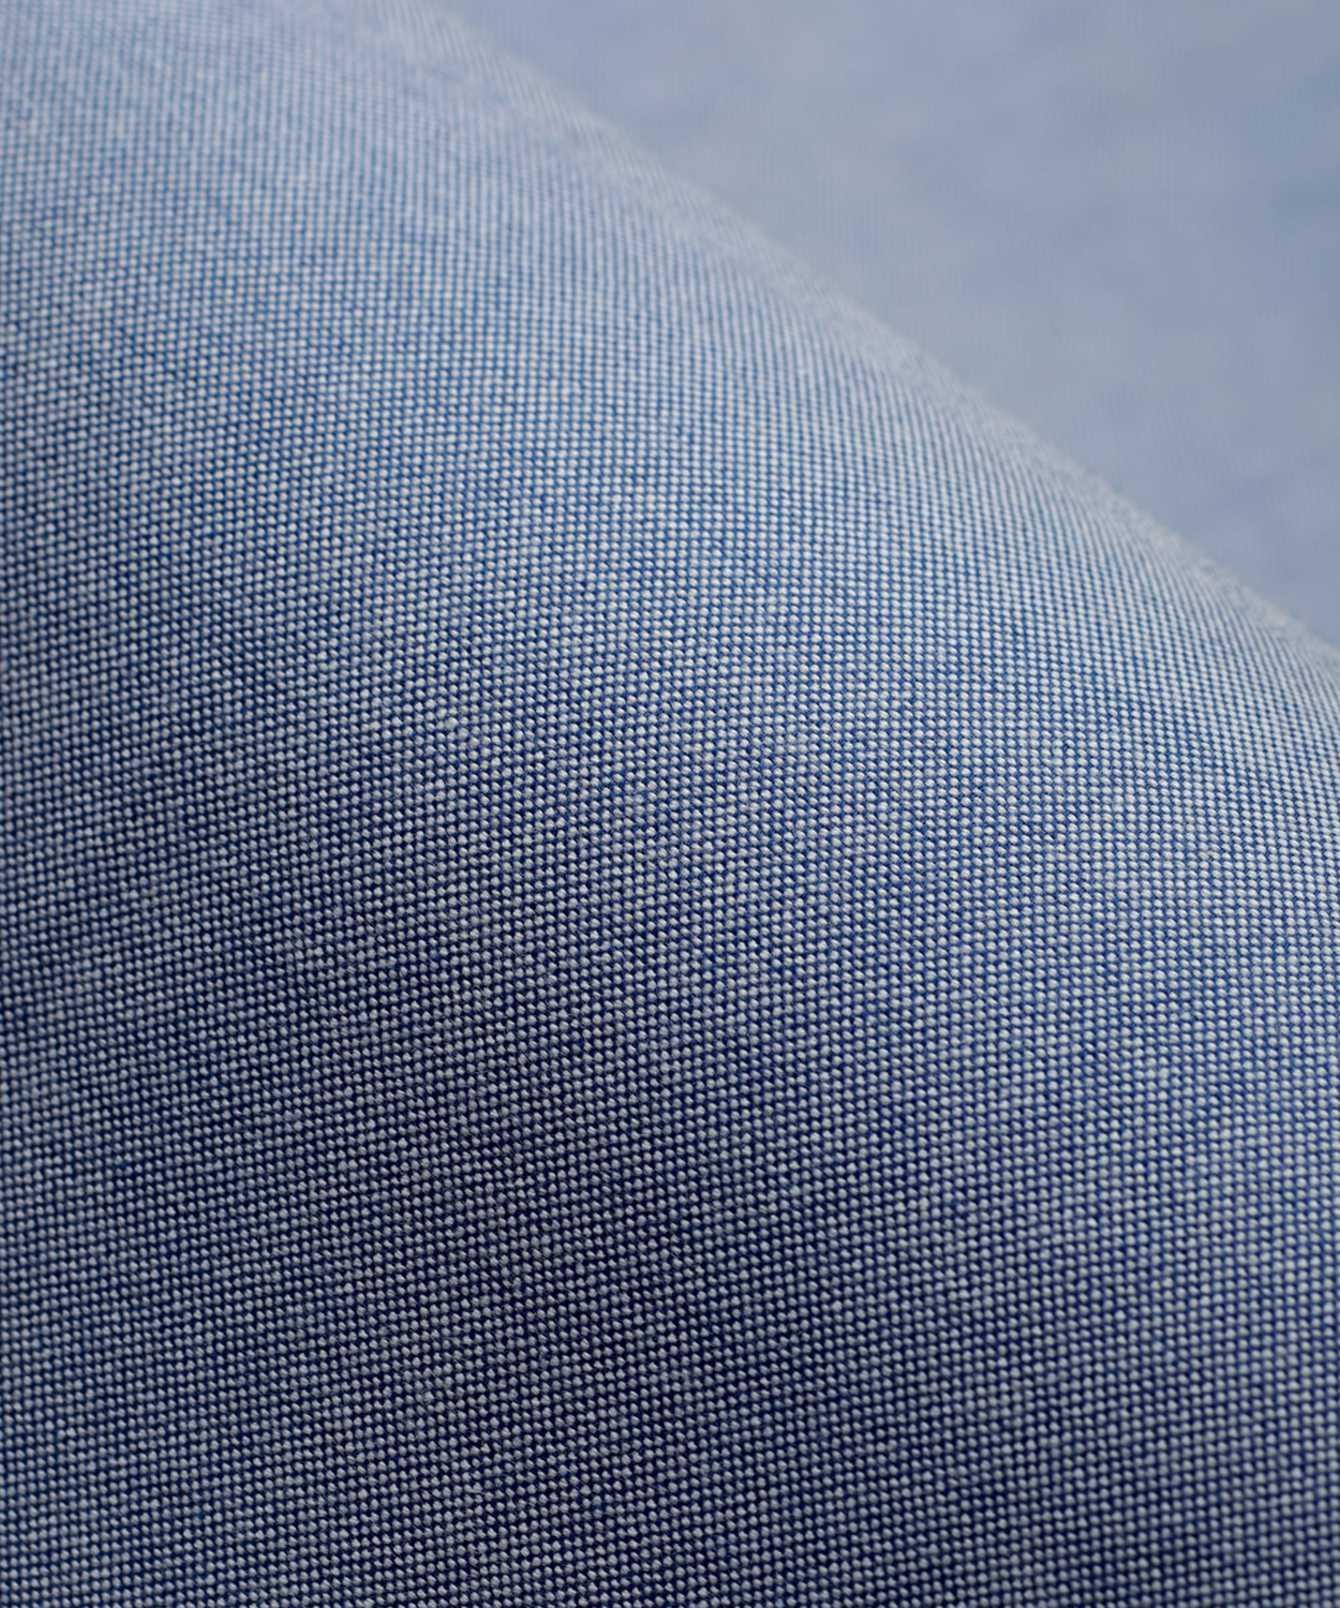 Shirt Hampton Oxford Blå The Shirt Factory